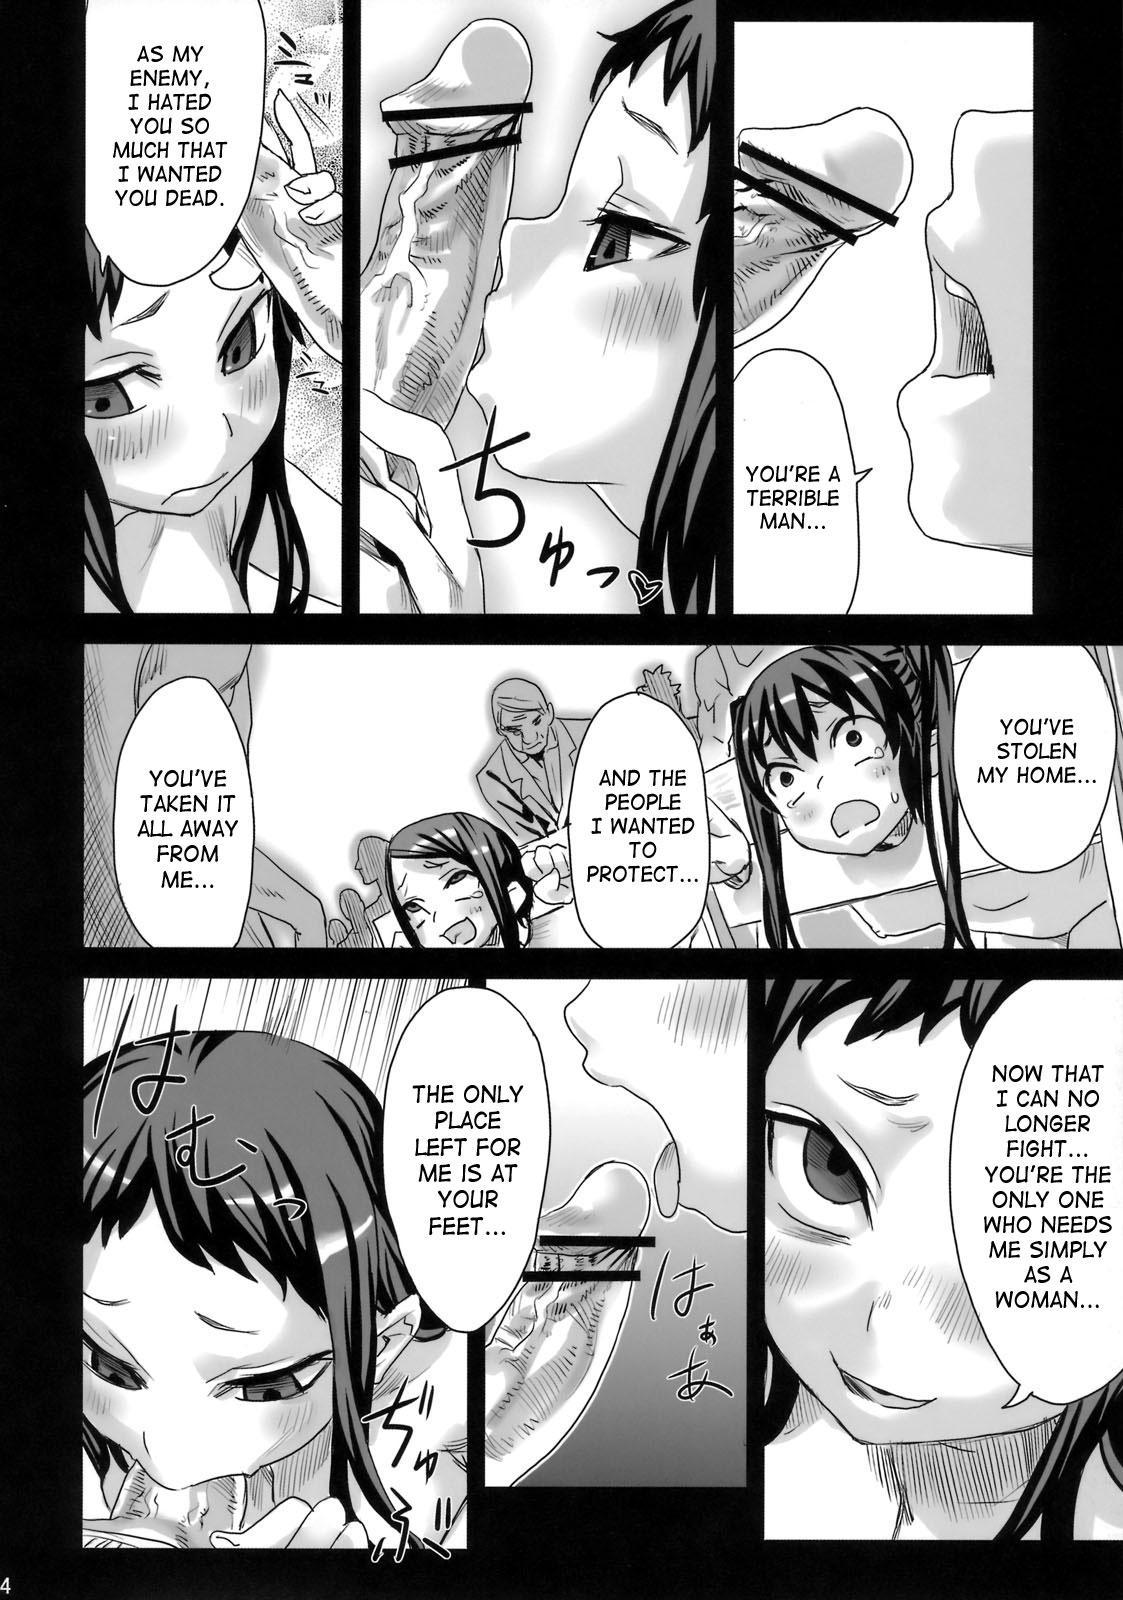 (C76) [Fatalpulse (Asanagi)] Victim Girls 7 - Jaku Niku Kyoushoku Dog-eat-Bitch (Fantasy Earth Zero) [English] [SaHa] 32